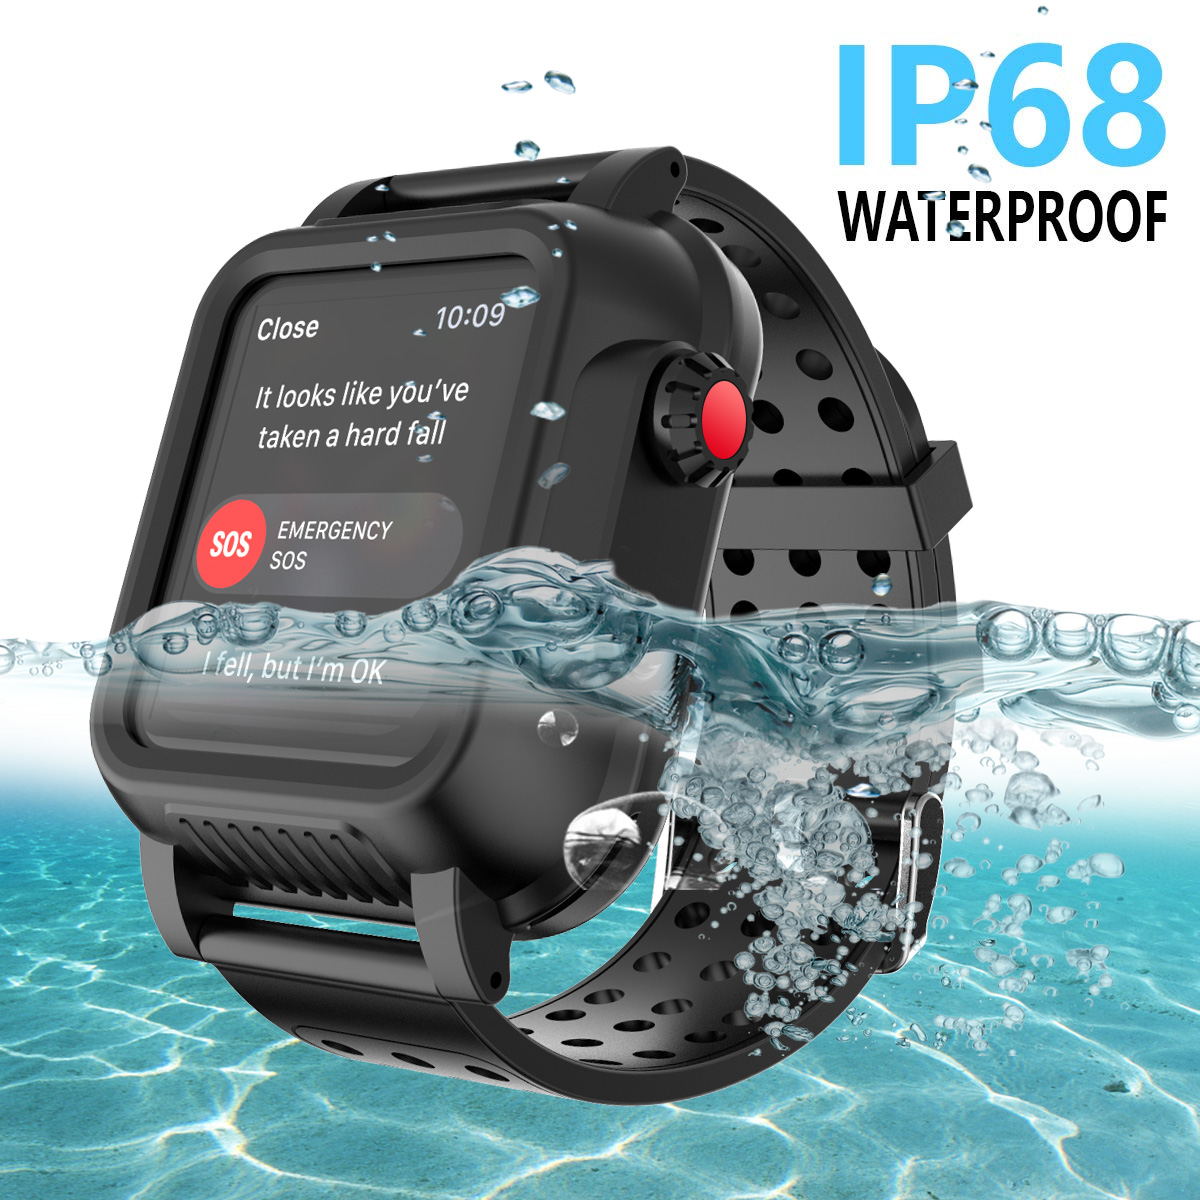 Hava Case & רצועה שנקבע IWatch סדרה 3/4 Band 38/42 / 44mm Band IP68 Waterproof צפה מחשב Case מגן Bumper (4)